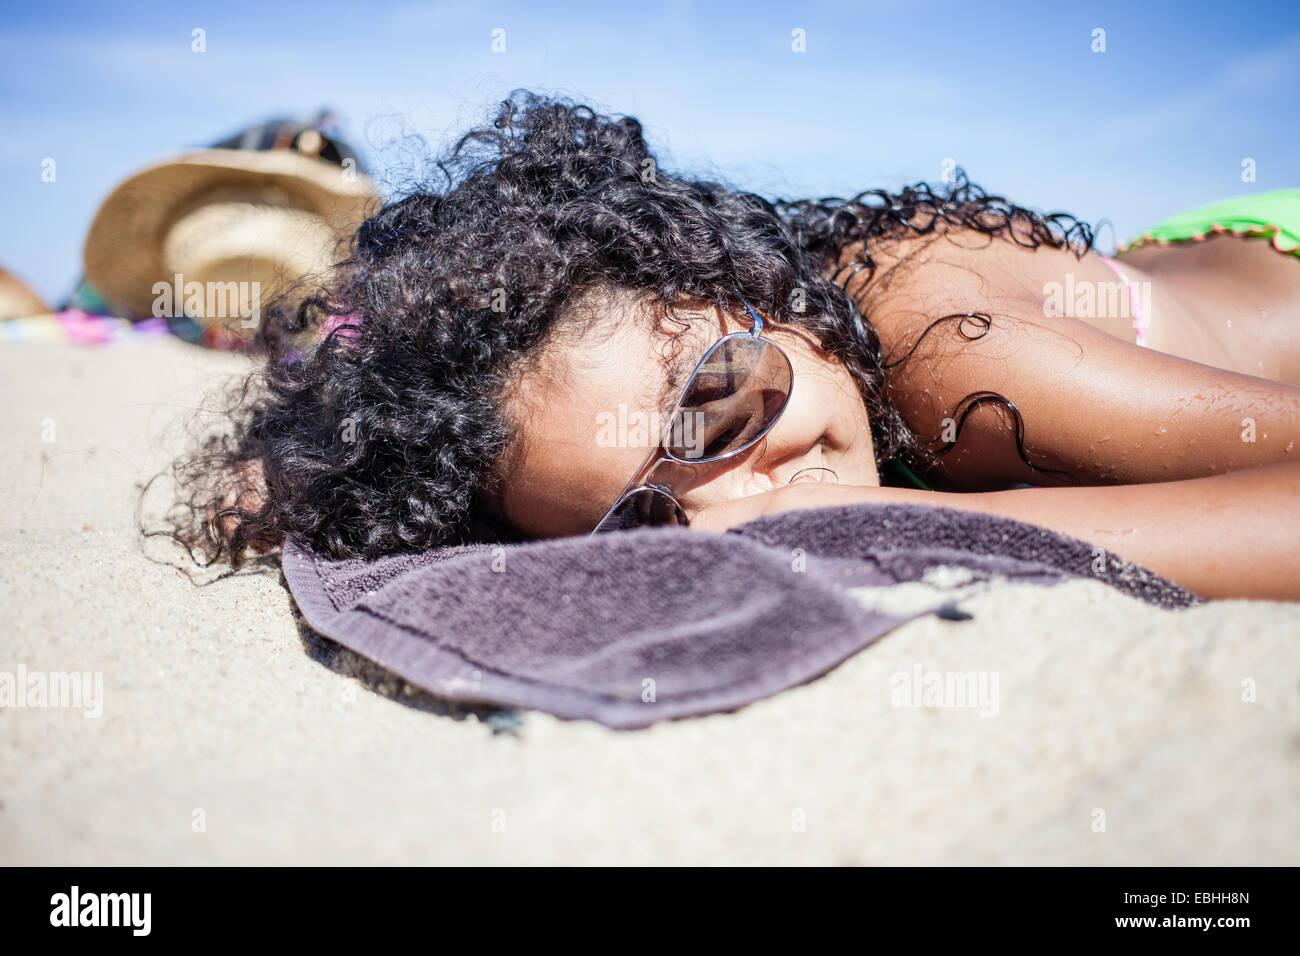 Girl sunbathing on beach, Truro, Massachusetts, Cape Cod, USA - Stock Image